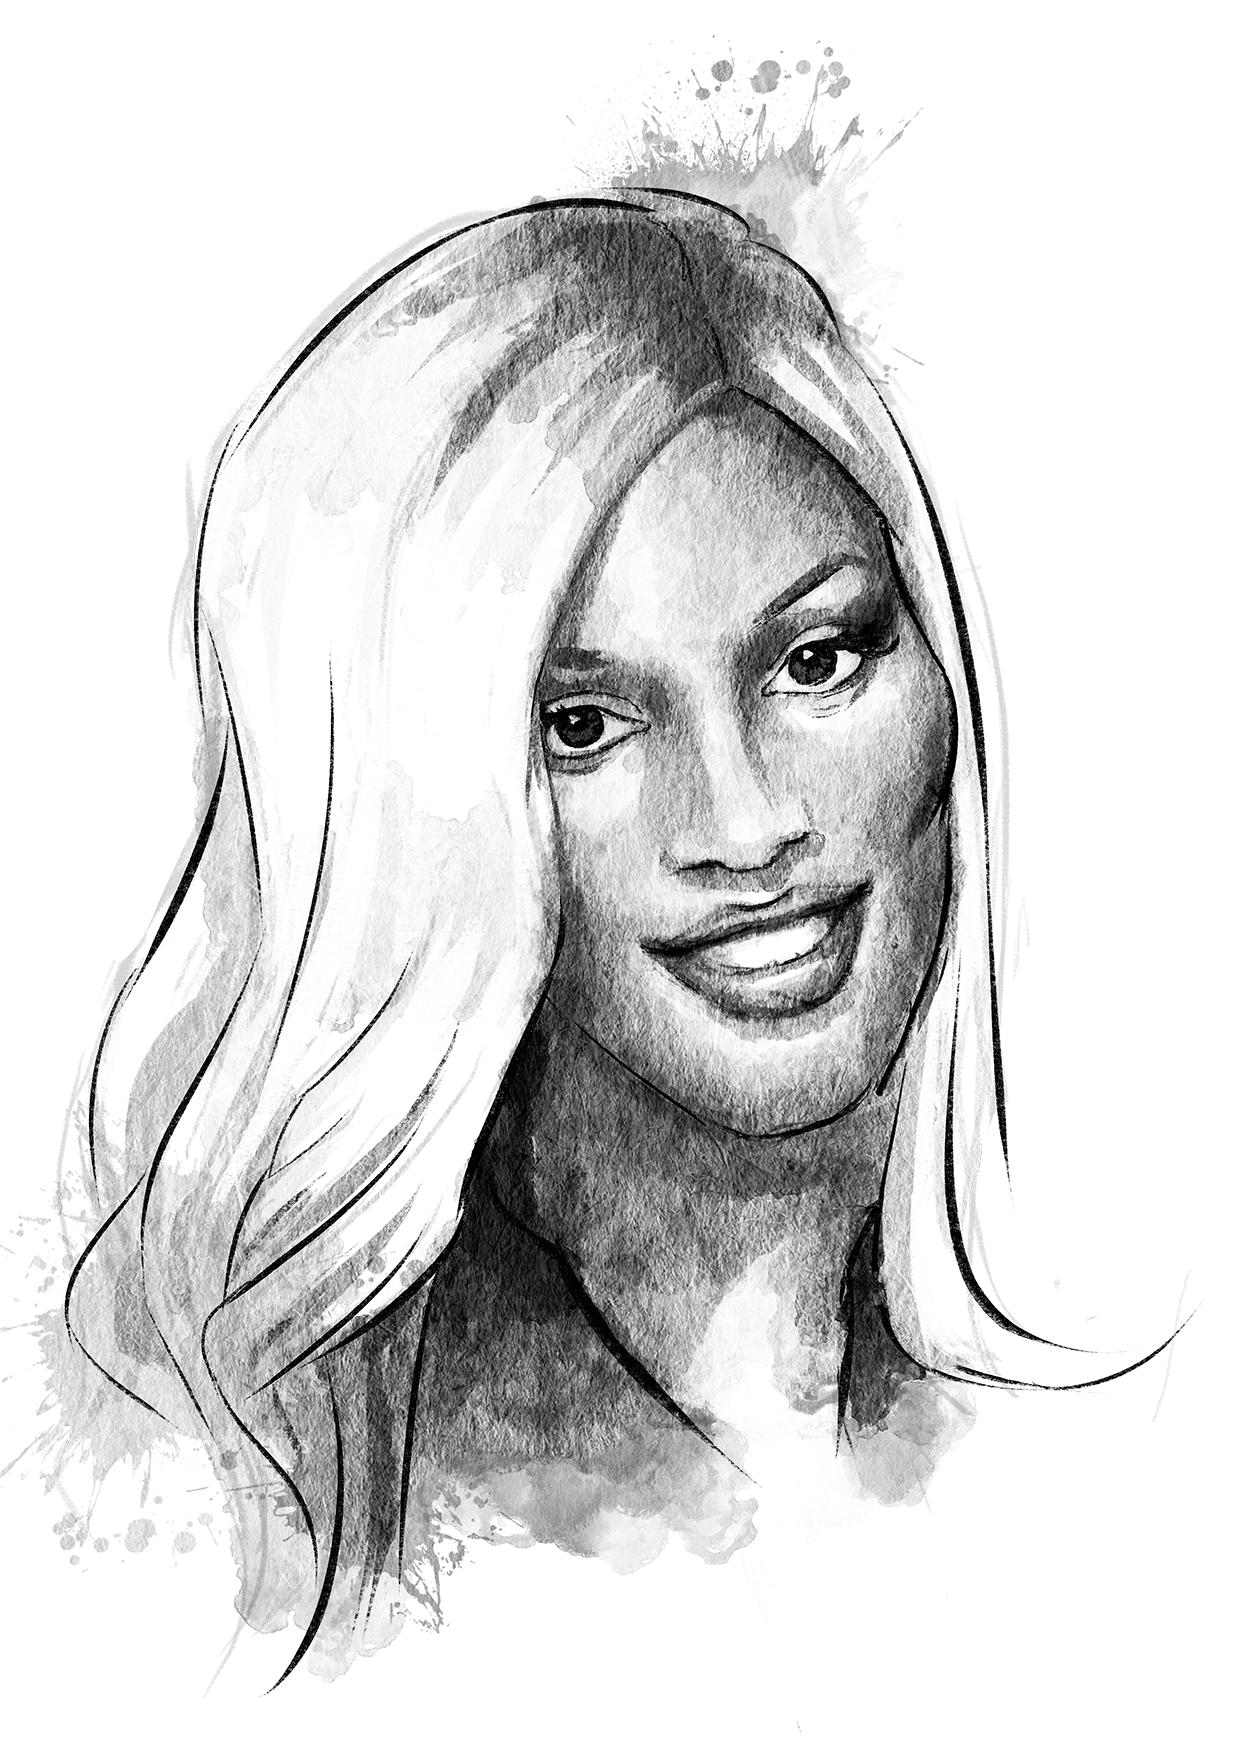 GLSEN LGBTQ+ History Cards - Image of Laverne Cox